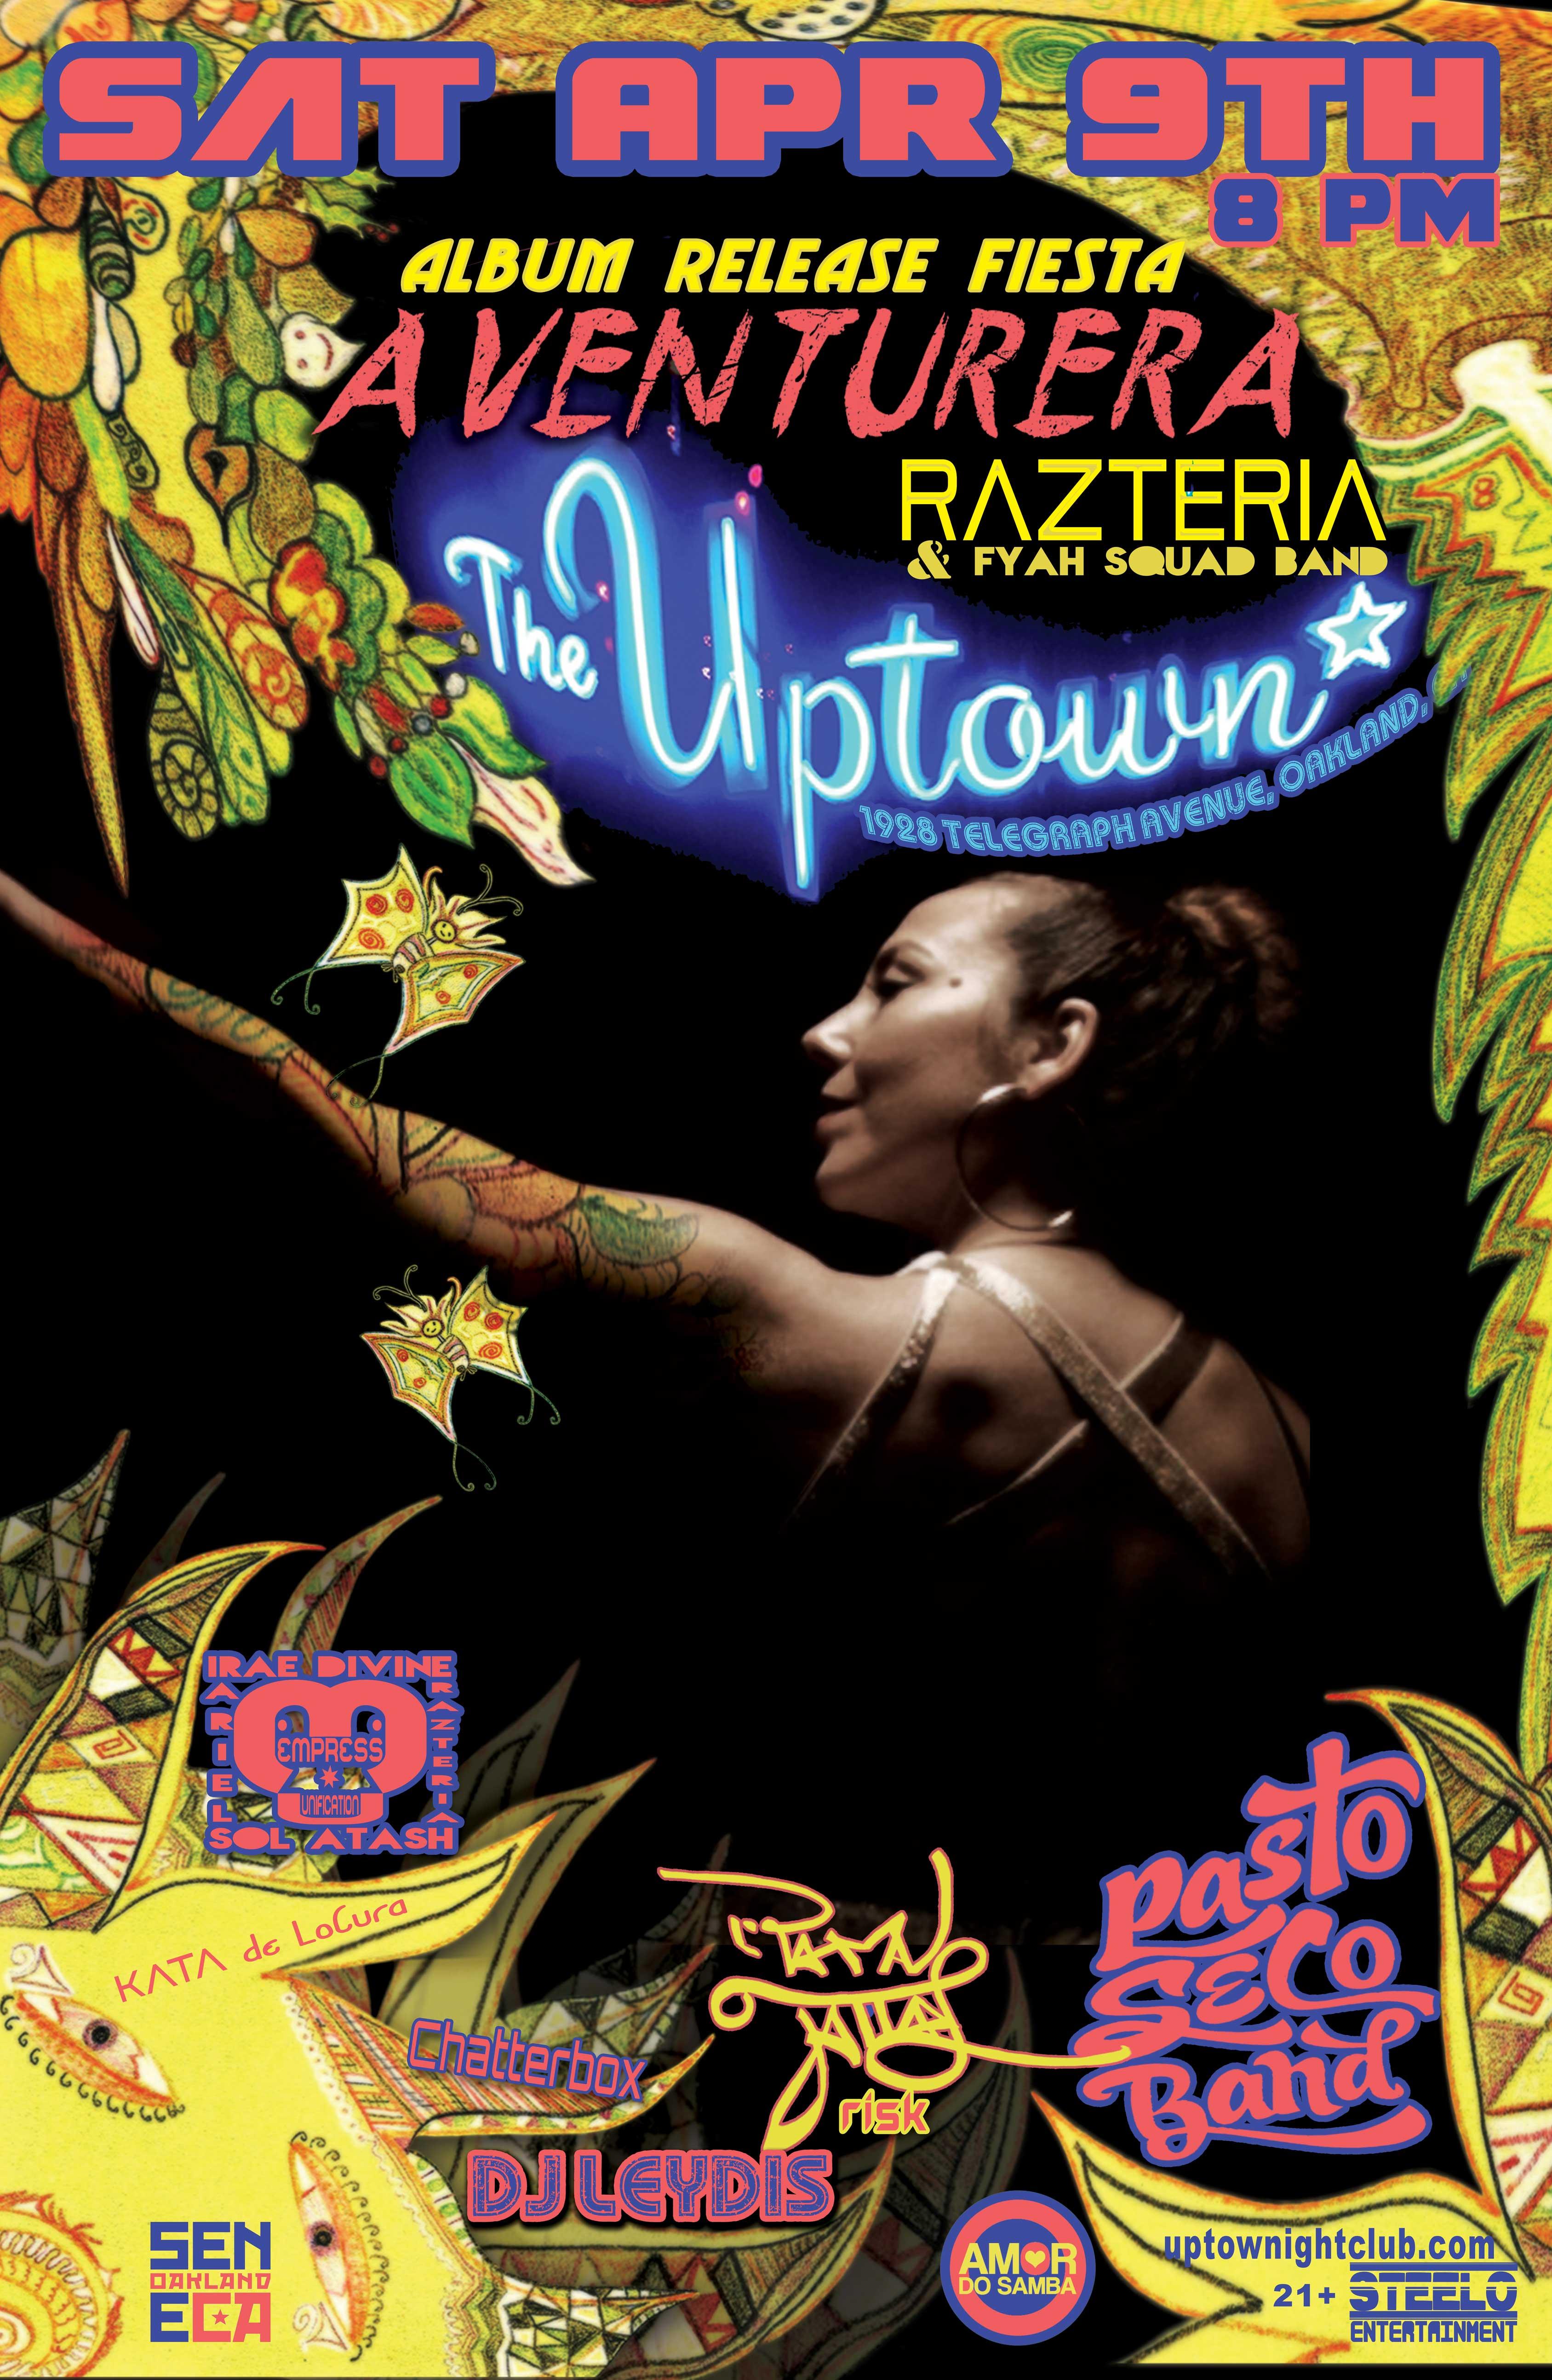 Razteria's Aventurera Album Release